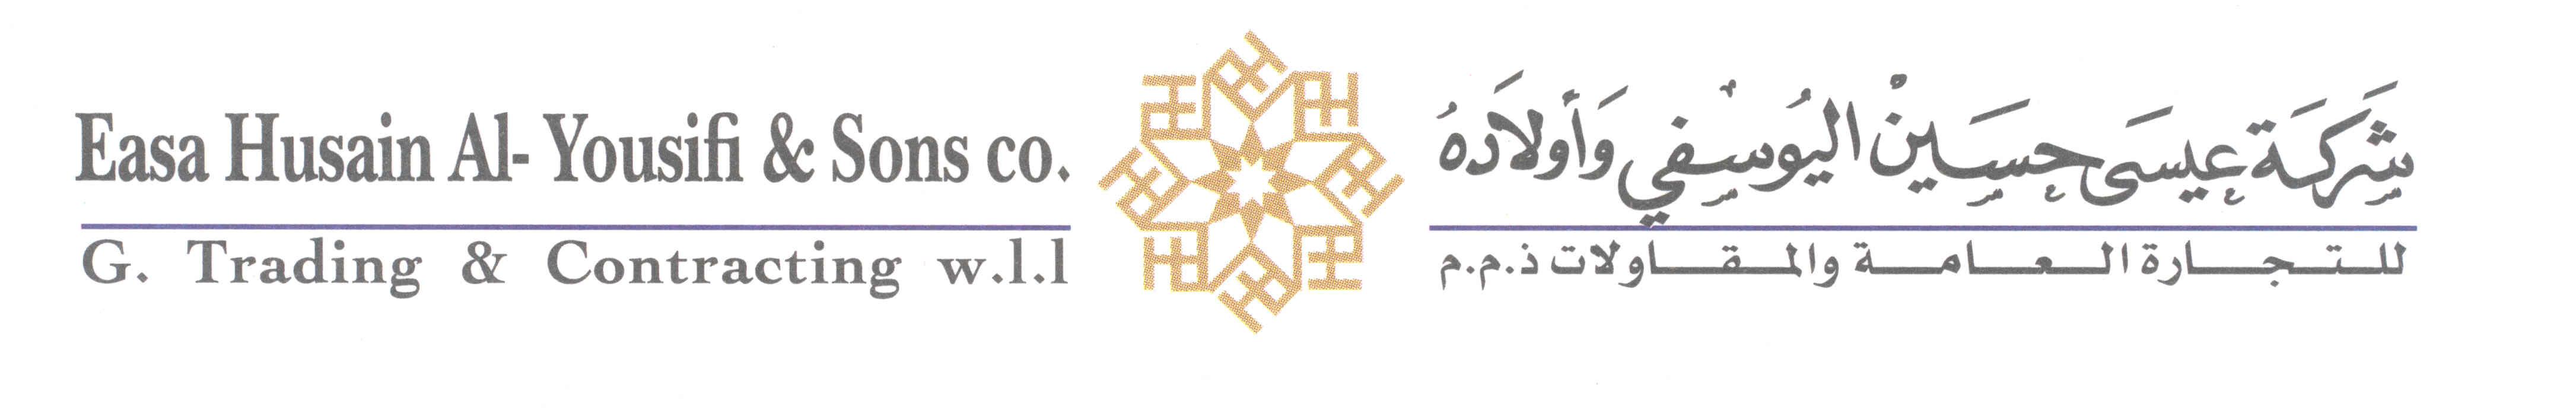 Yousifi Full Logo.jpg